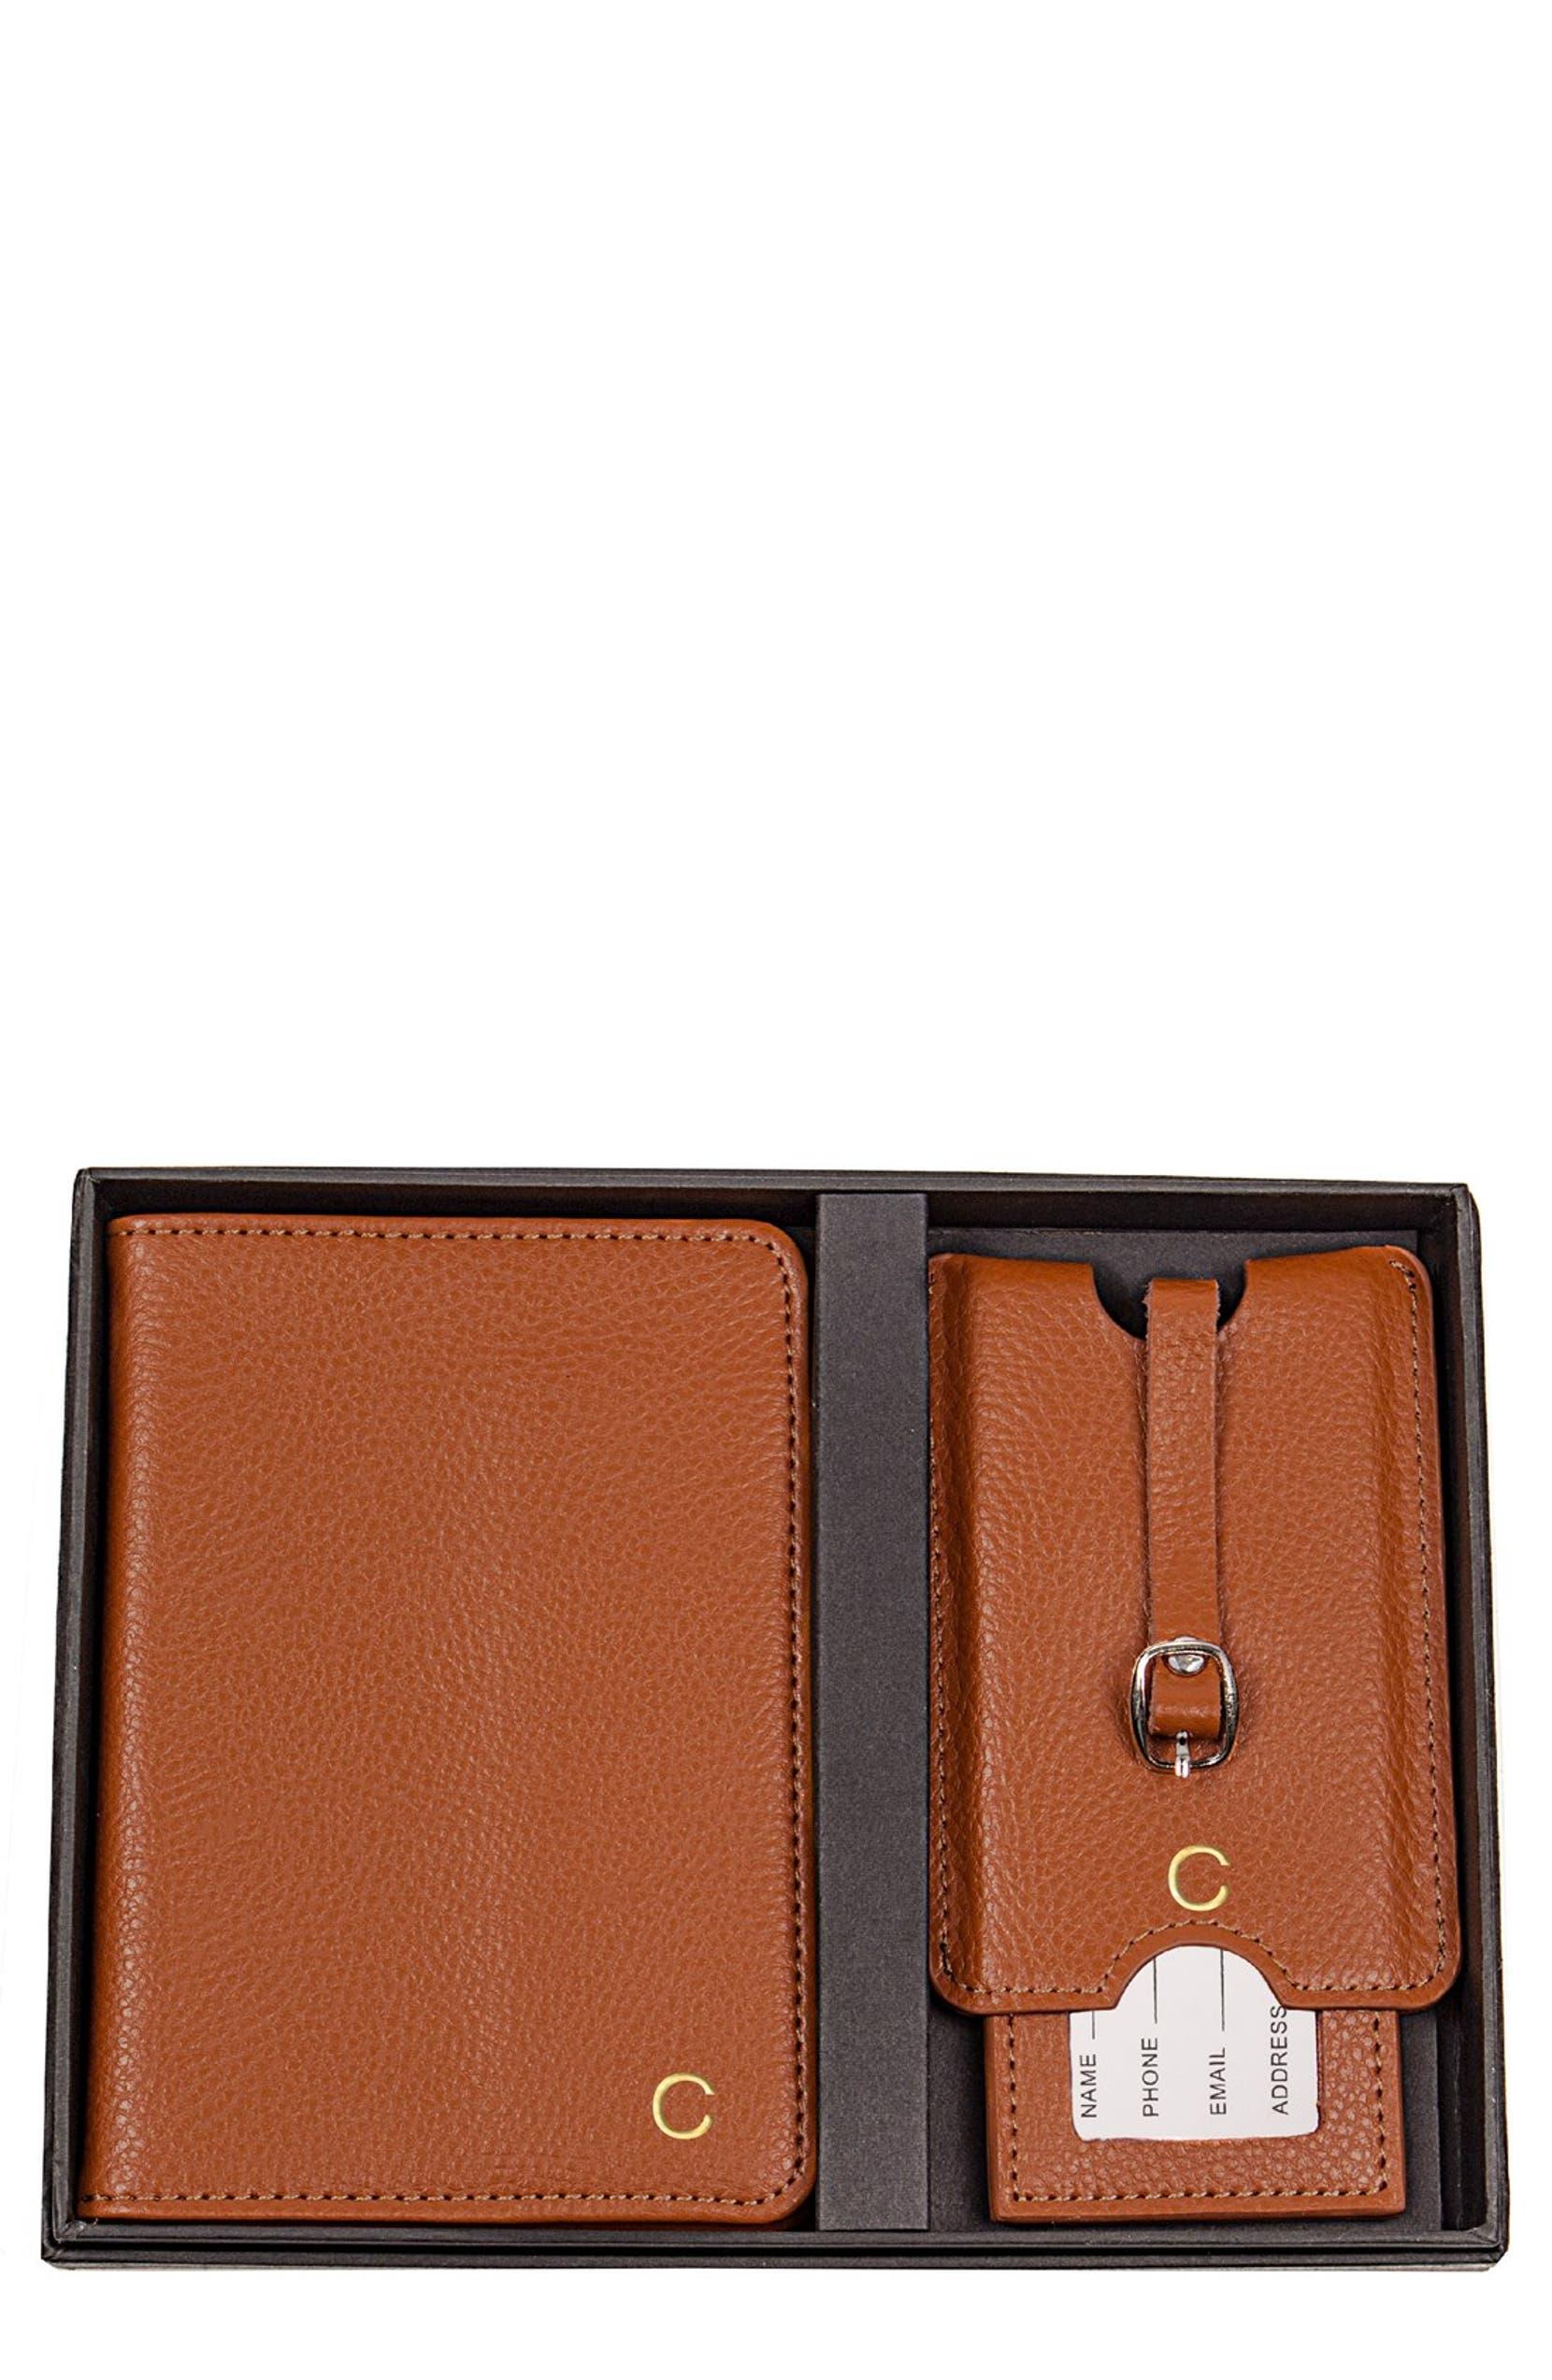 8abbc37ca03 Cathy s Concepts Monogram Passport Case   Luggage Tag